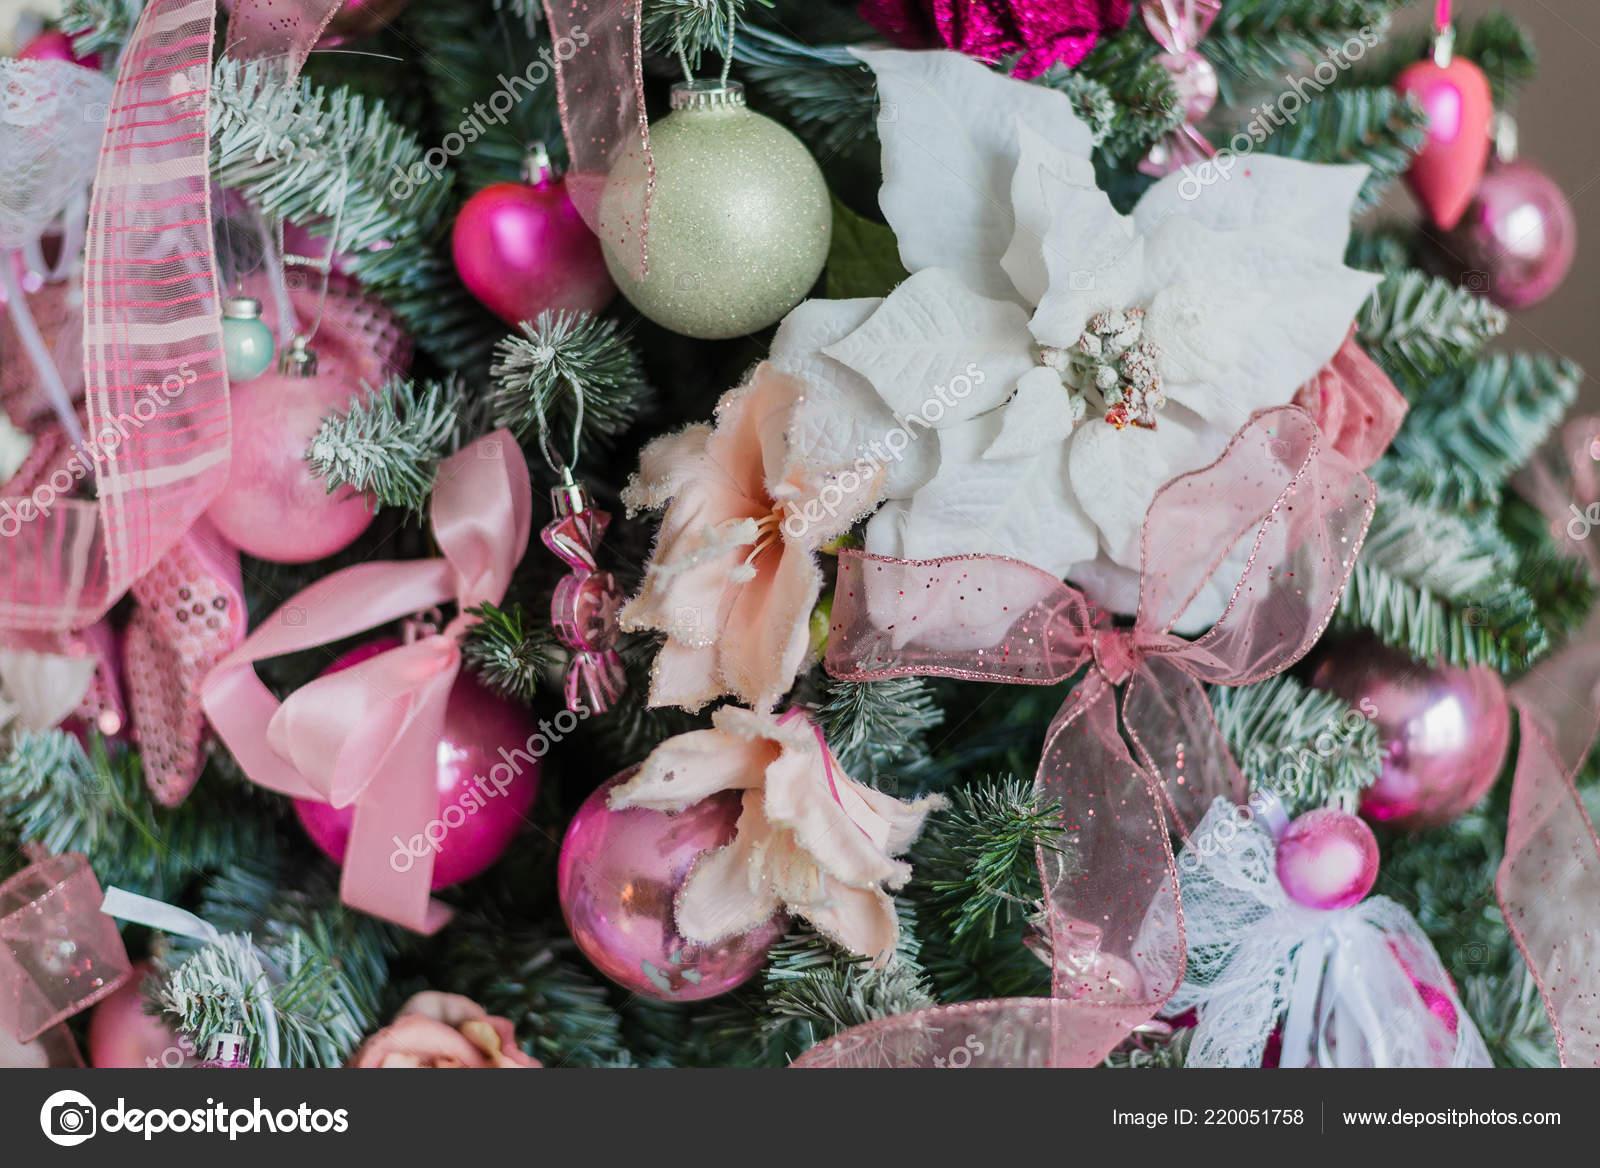 Christmas Tree Decorations In A Pink Colors Stock Photo C Romankosolapov 220051758